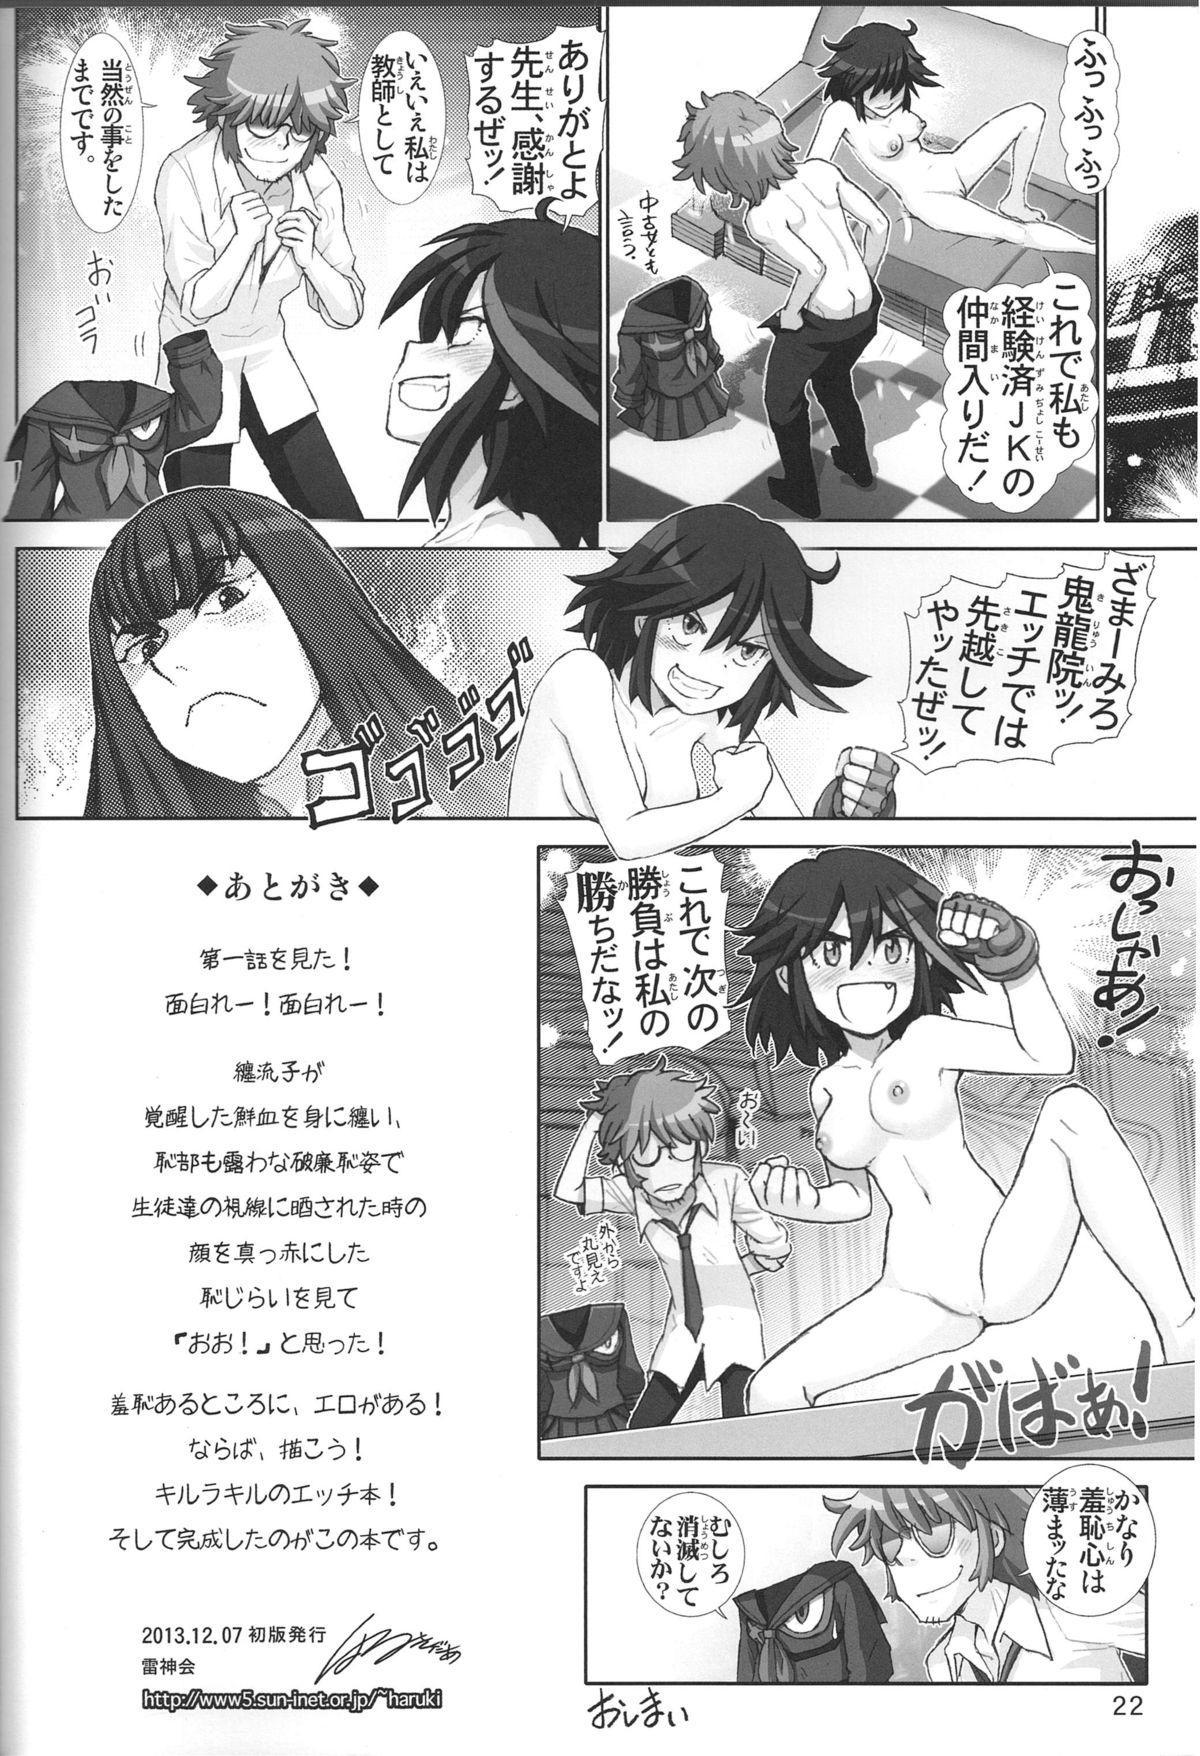 Ryuuko no Susume 20